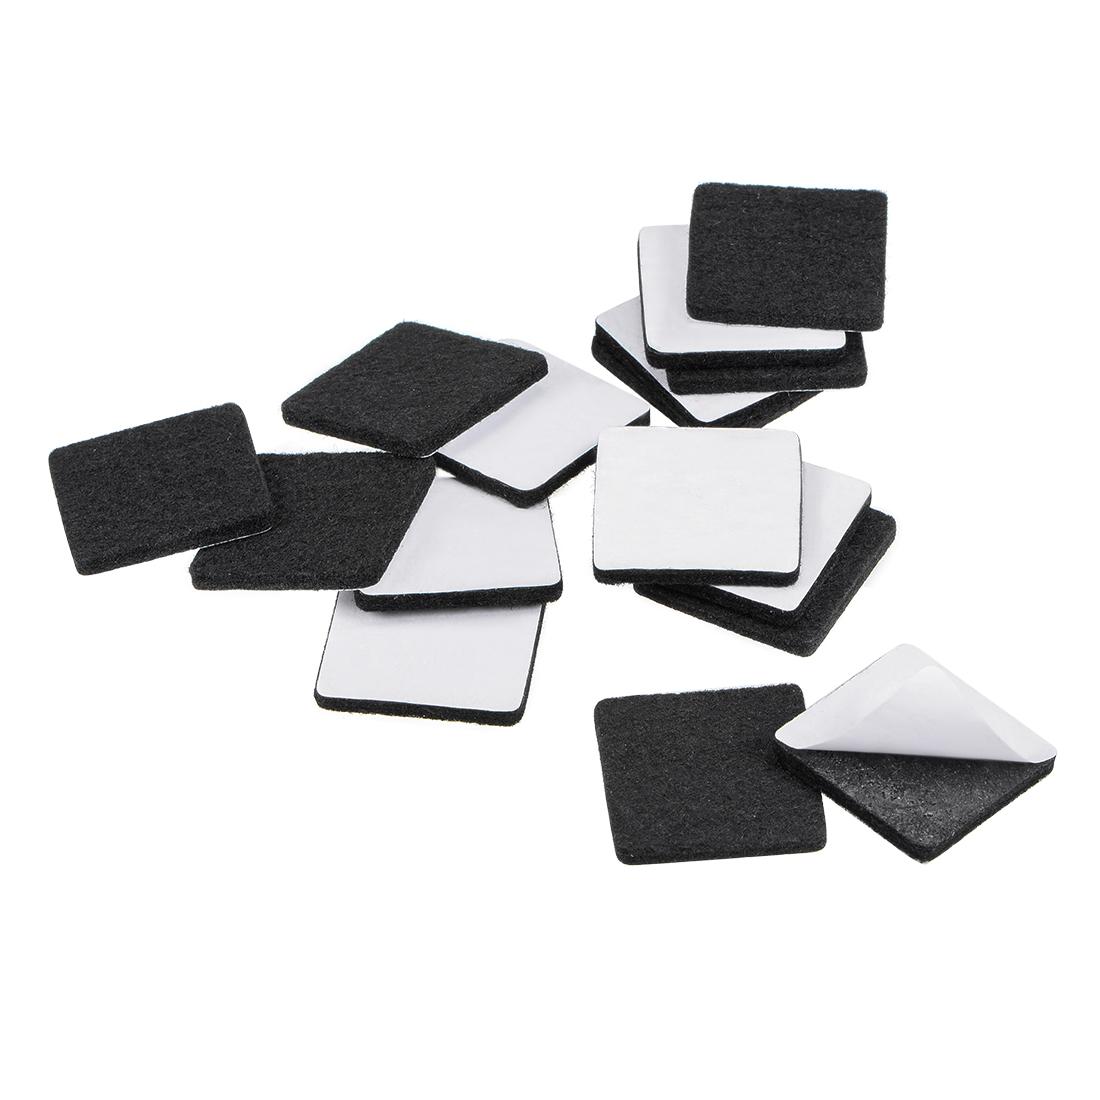 Furniture Pads Adhesive Felt Pads 30mm x 30mm Square 3mm Thick Black 48Pcs